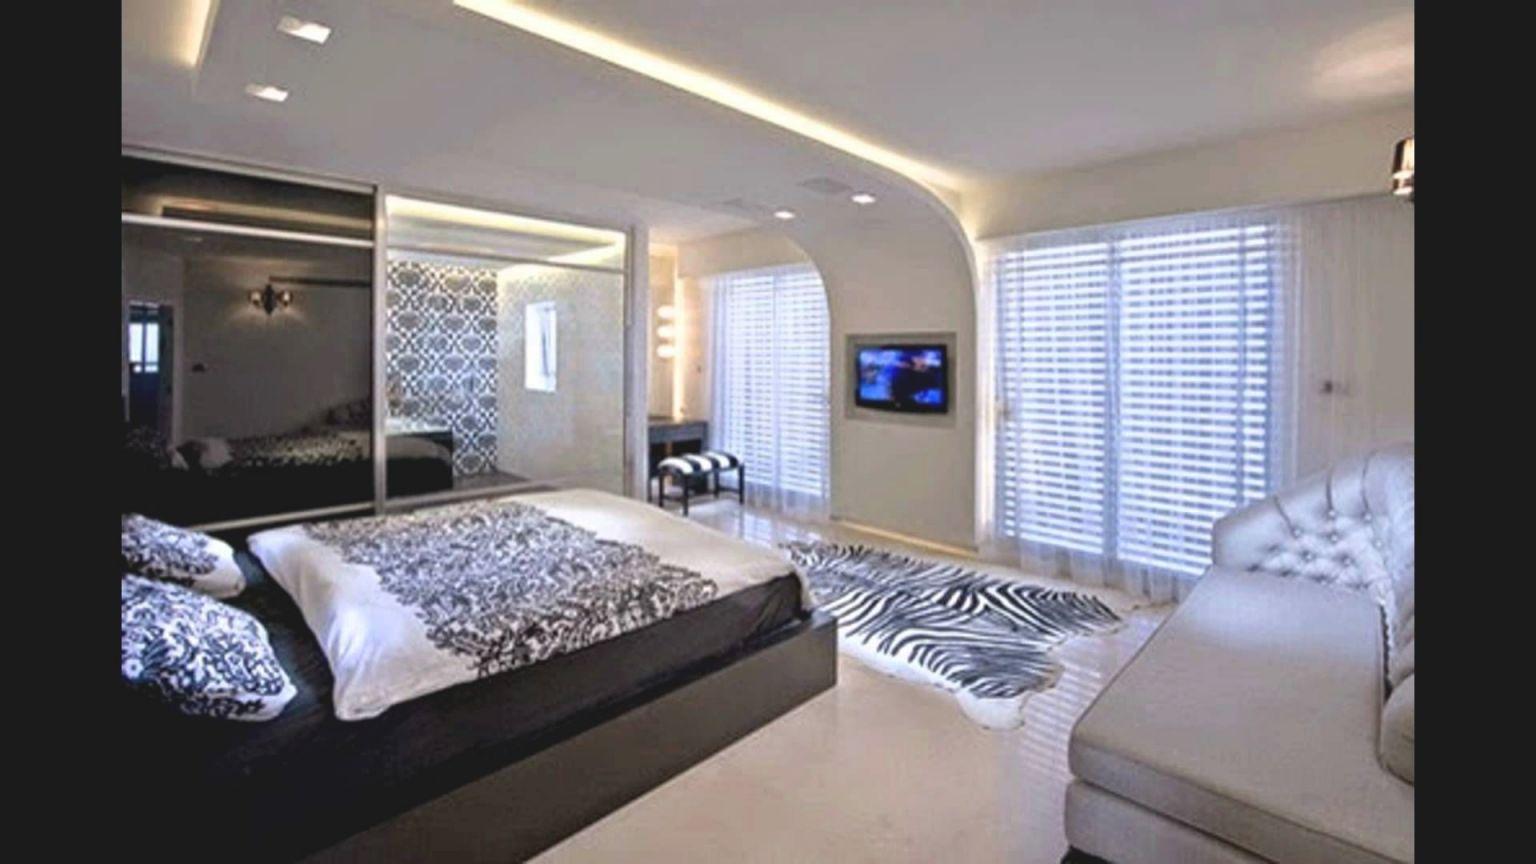 Pop Design For Bedroom. Help Me Decorate My Bedroom with regard to Best of Ideas To Decorate My Bedroom